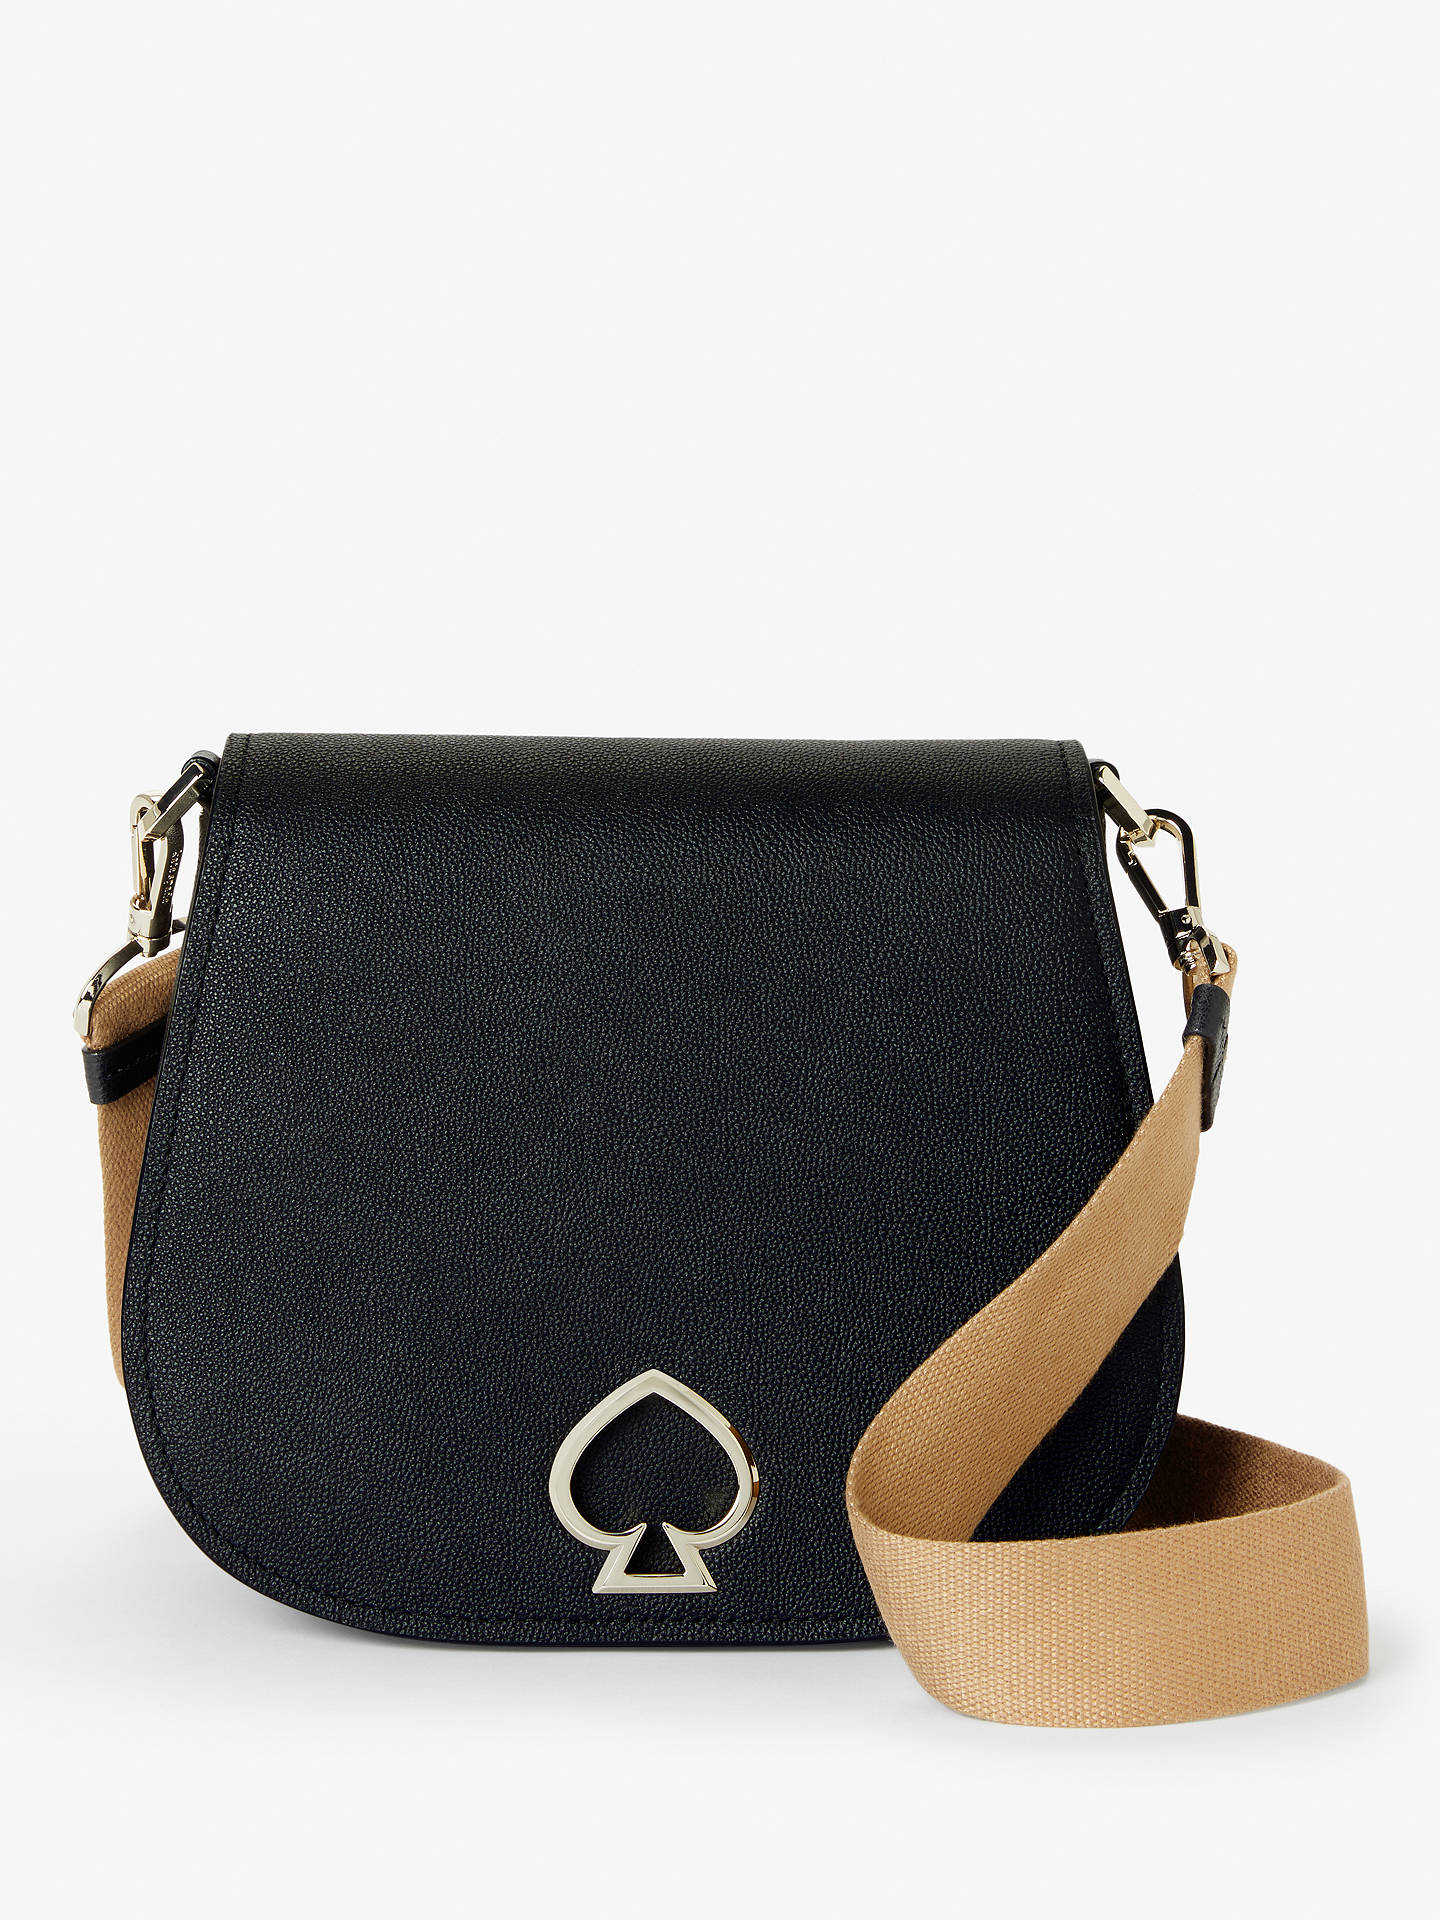 92588cf0fae50 Buy kate spade new york Suzy Large Saddle Leather Cross Body Bag, Black  Online at ...